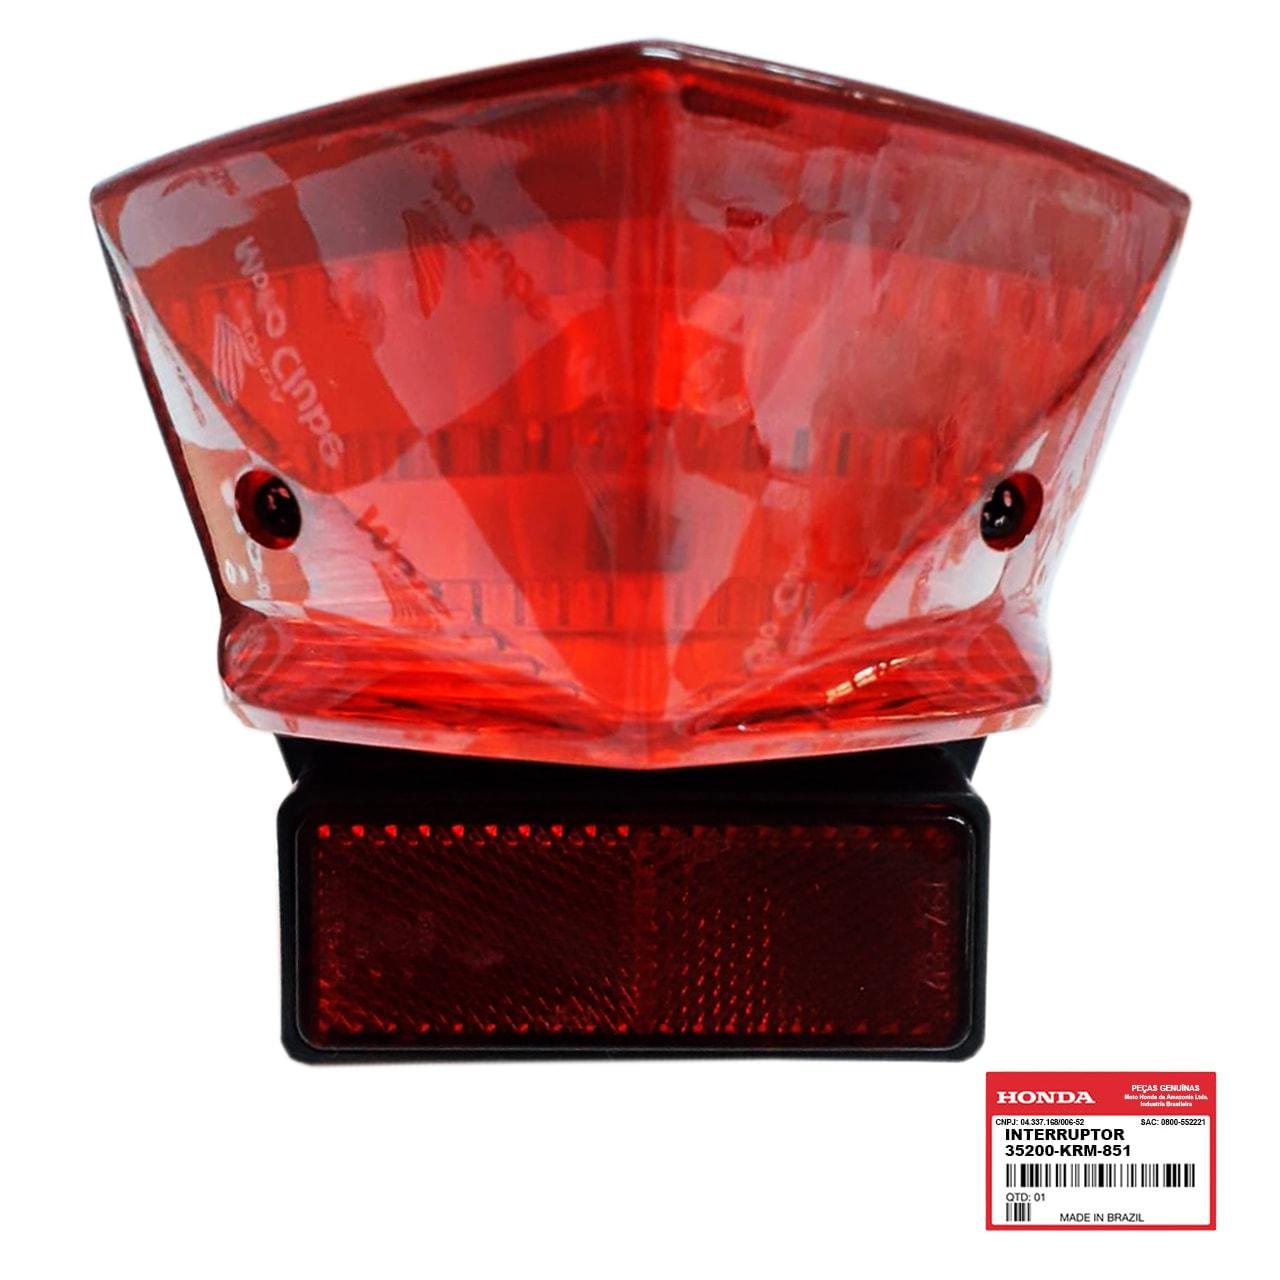 Estopa Lanterna Traseira CB 300 R RA 2010 2011 Original Honda 33700KVK901